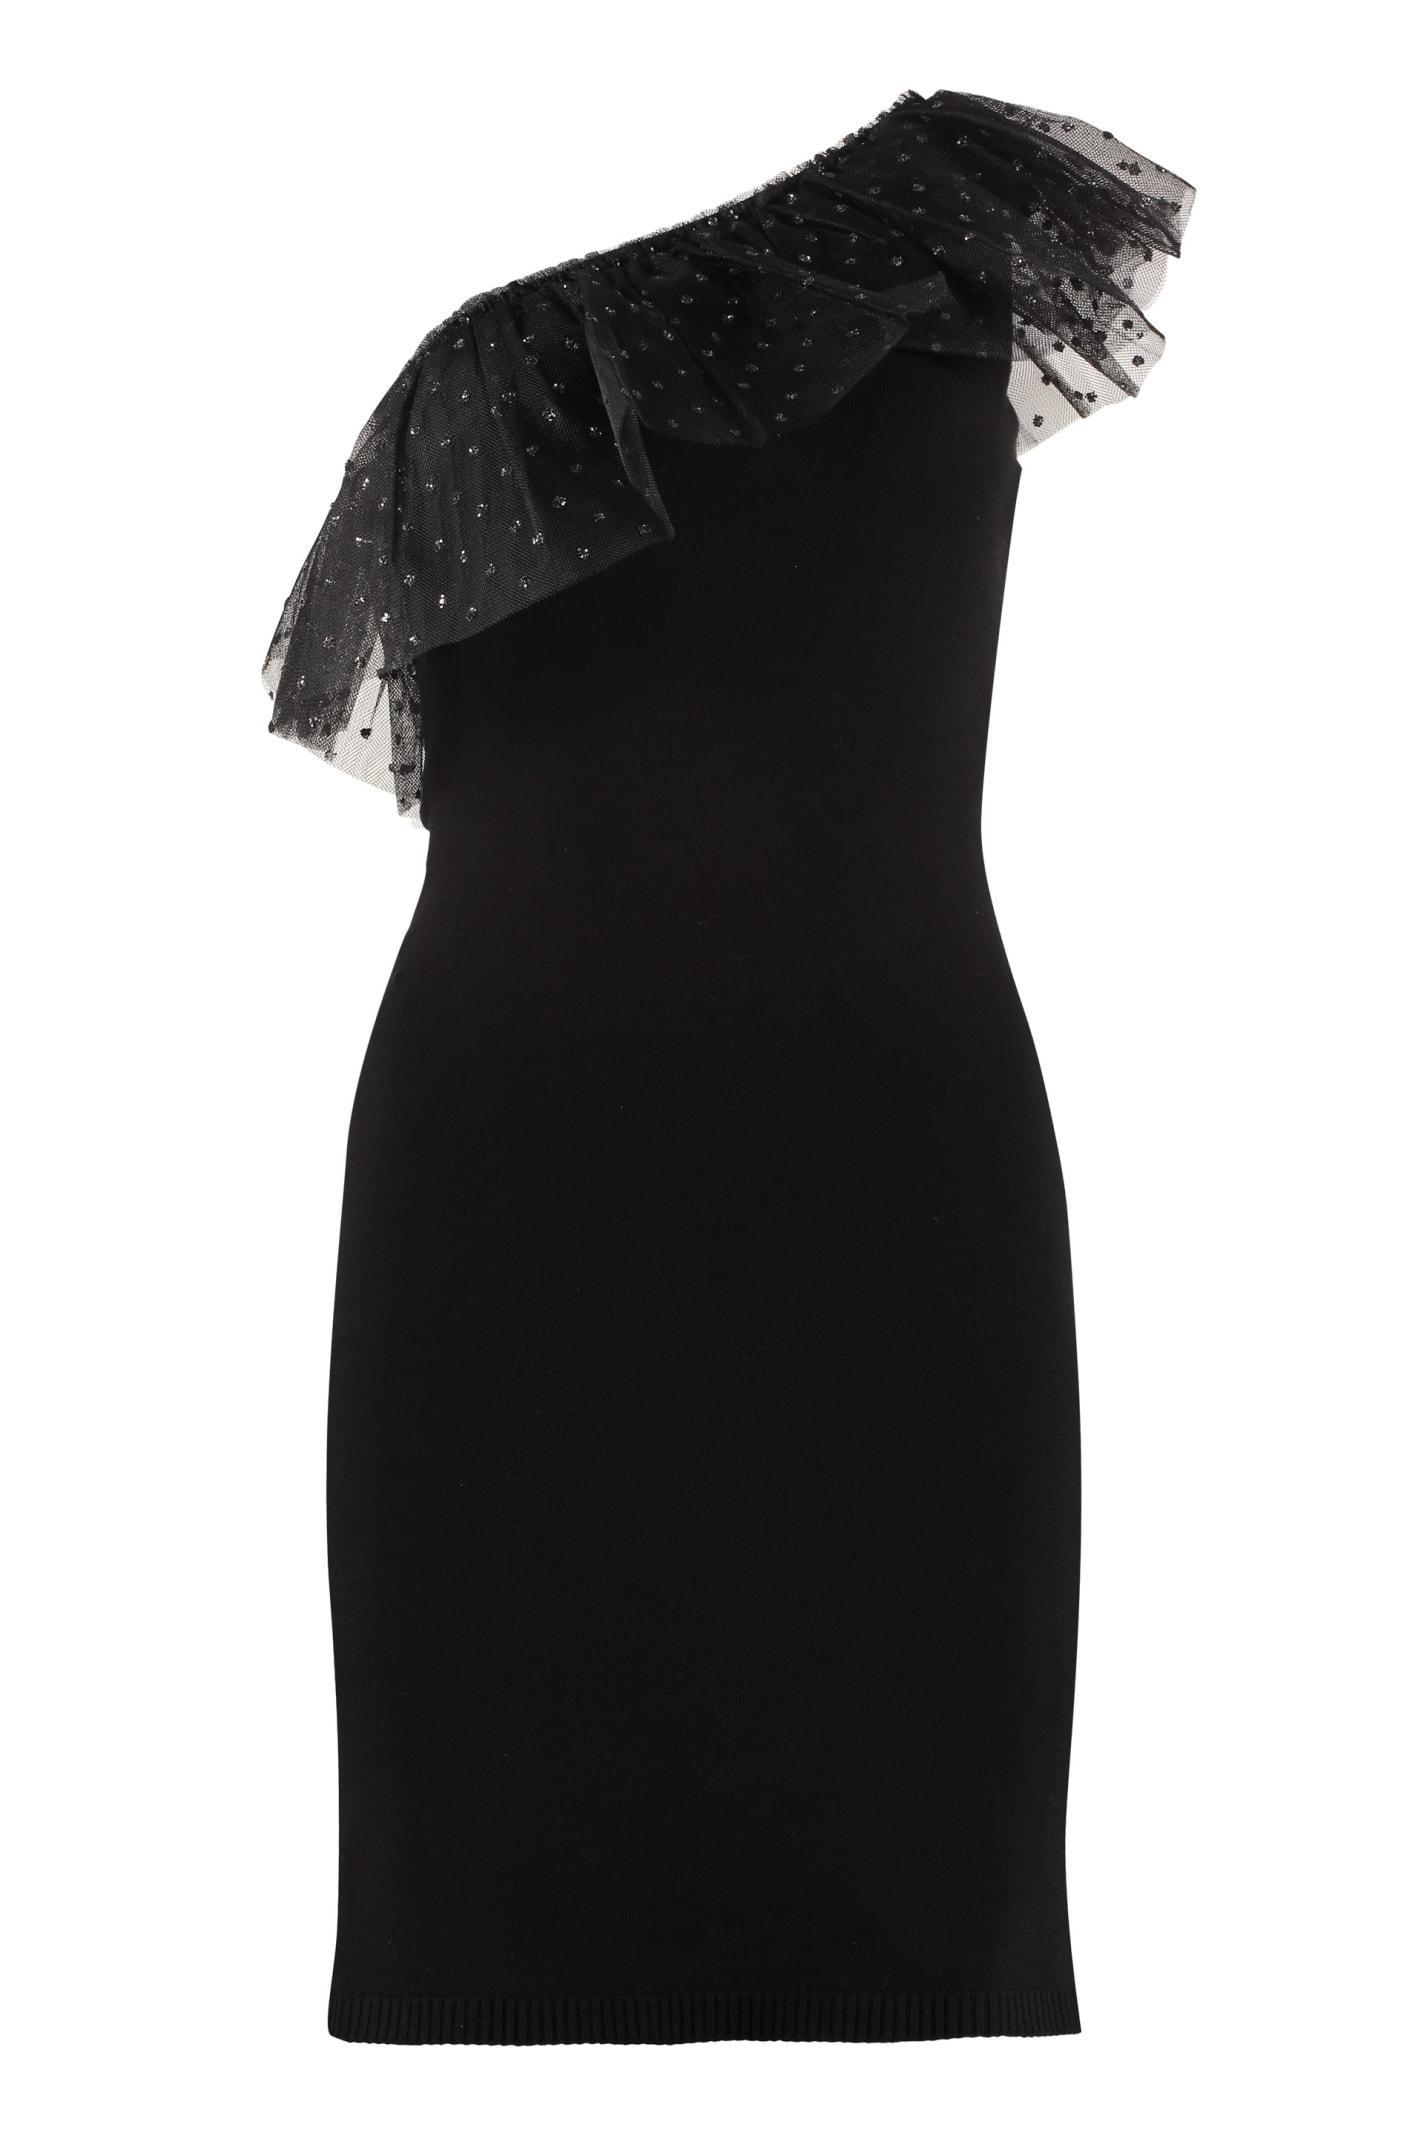 RED Valentino Asymmetric Knit Dress